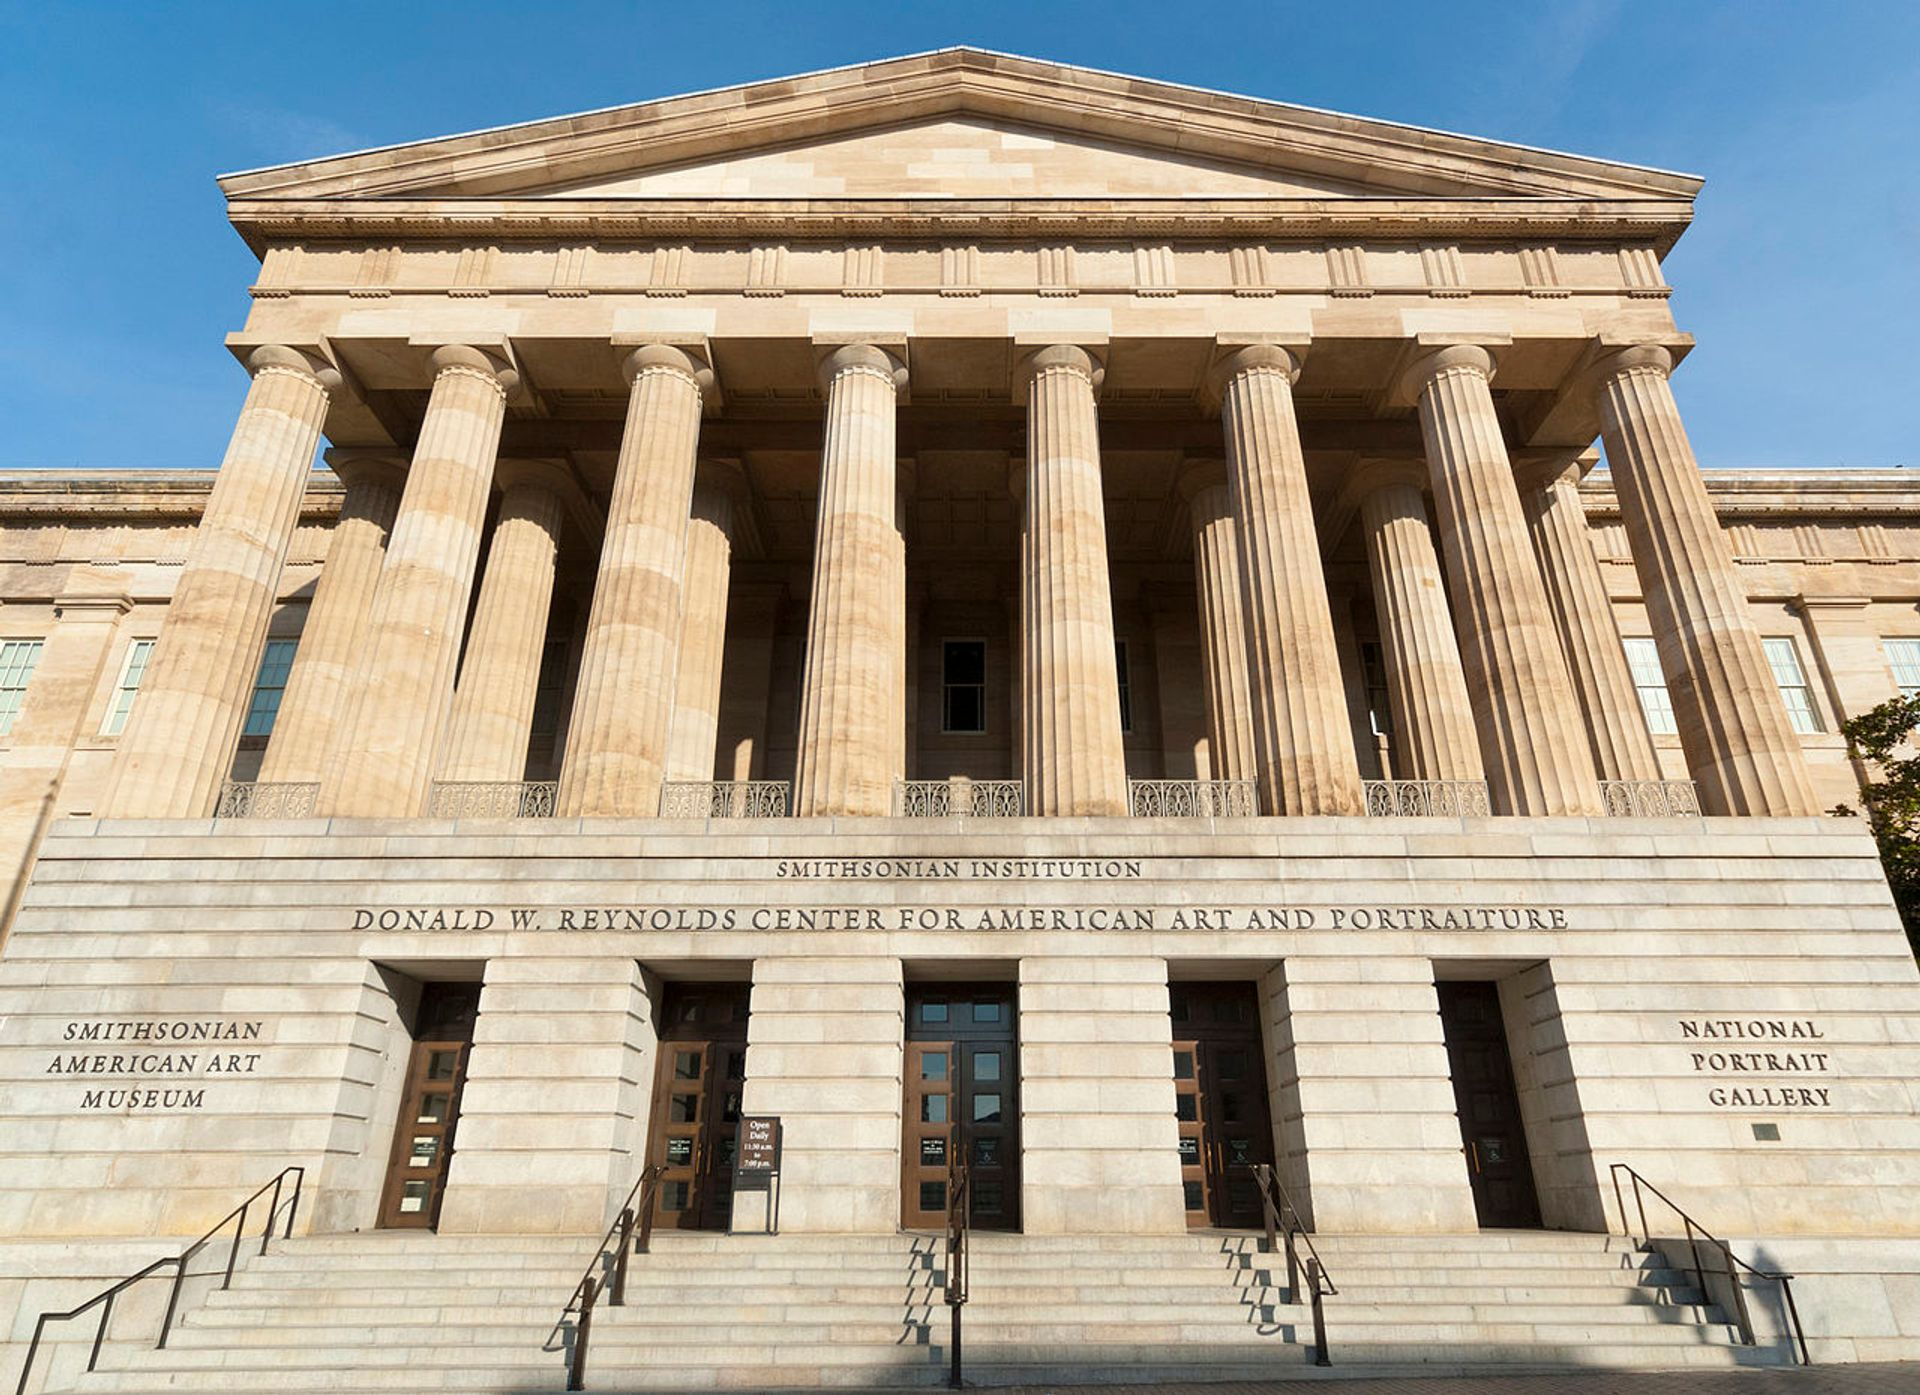 The Smithsonian American Art Museum in Washington, DC